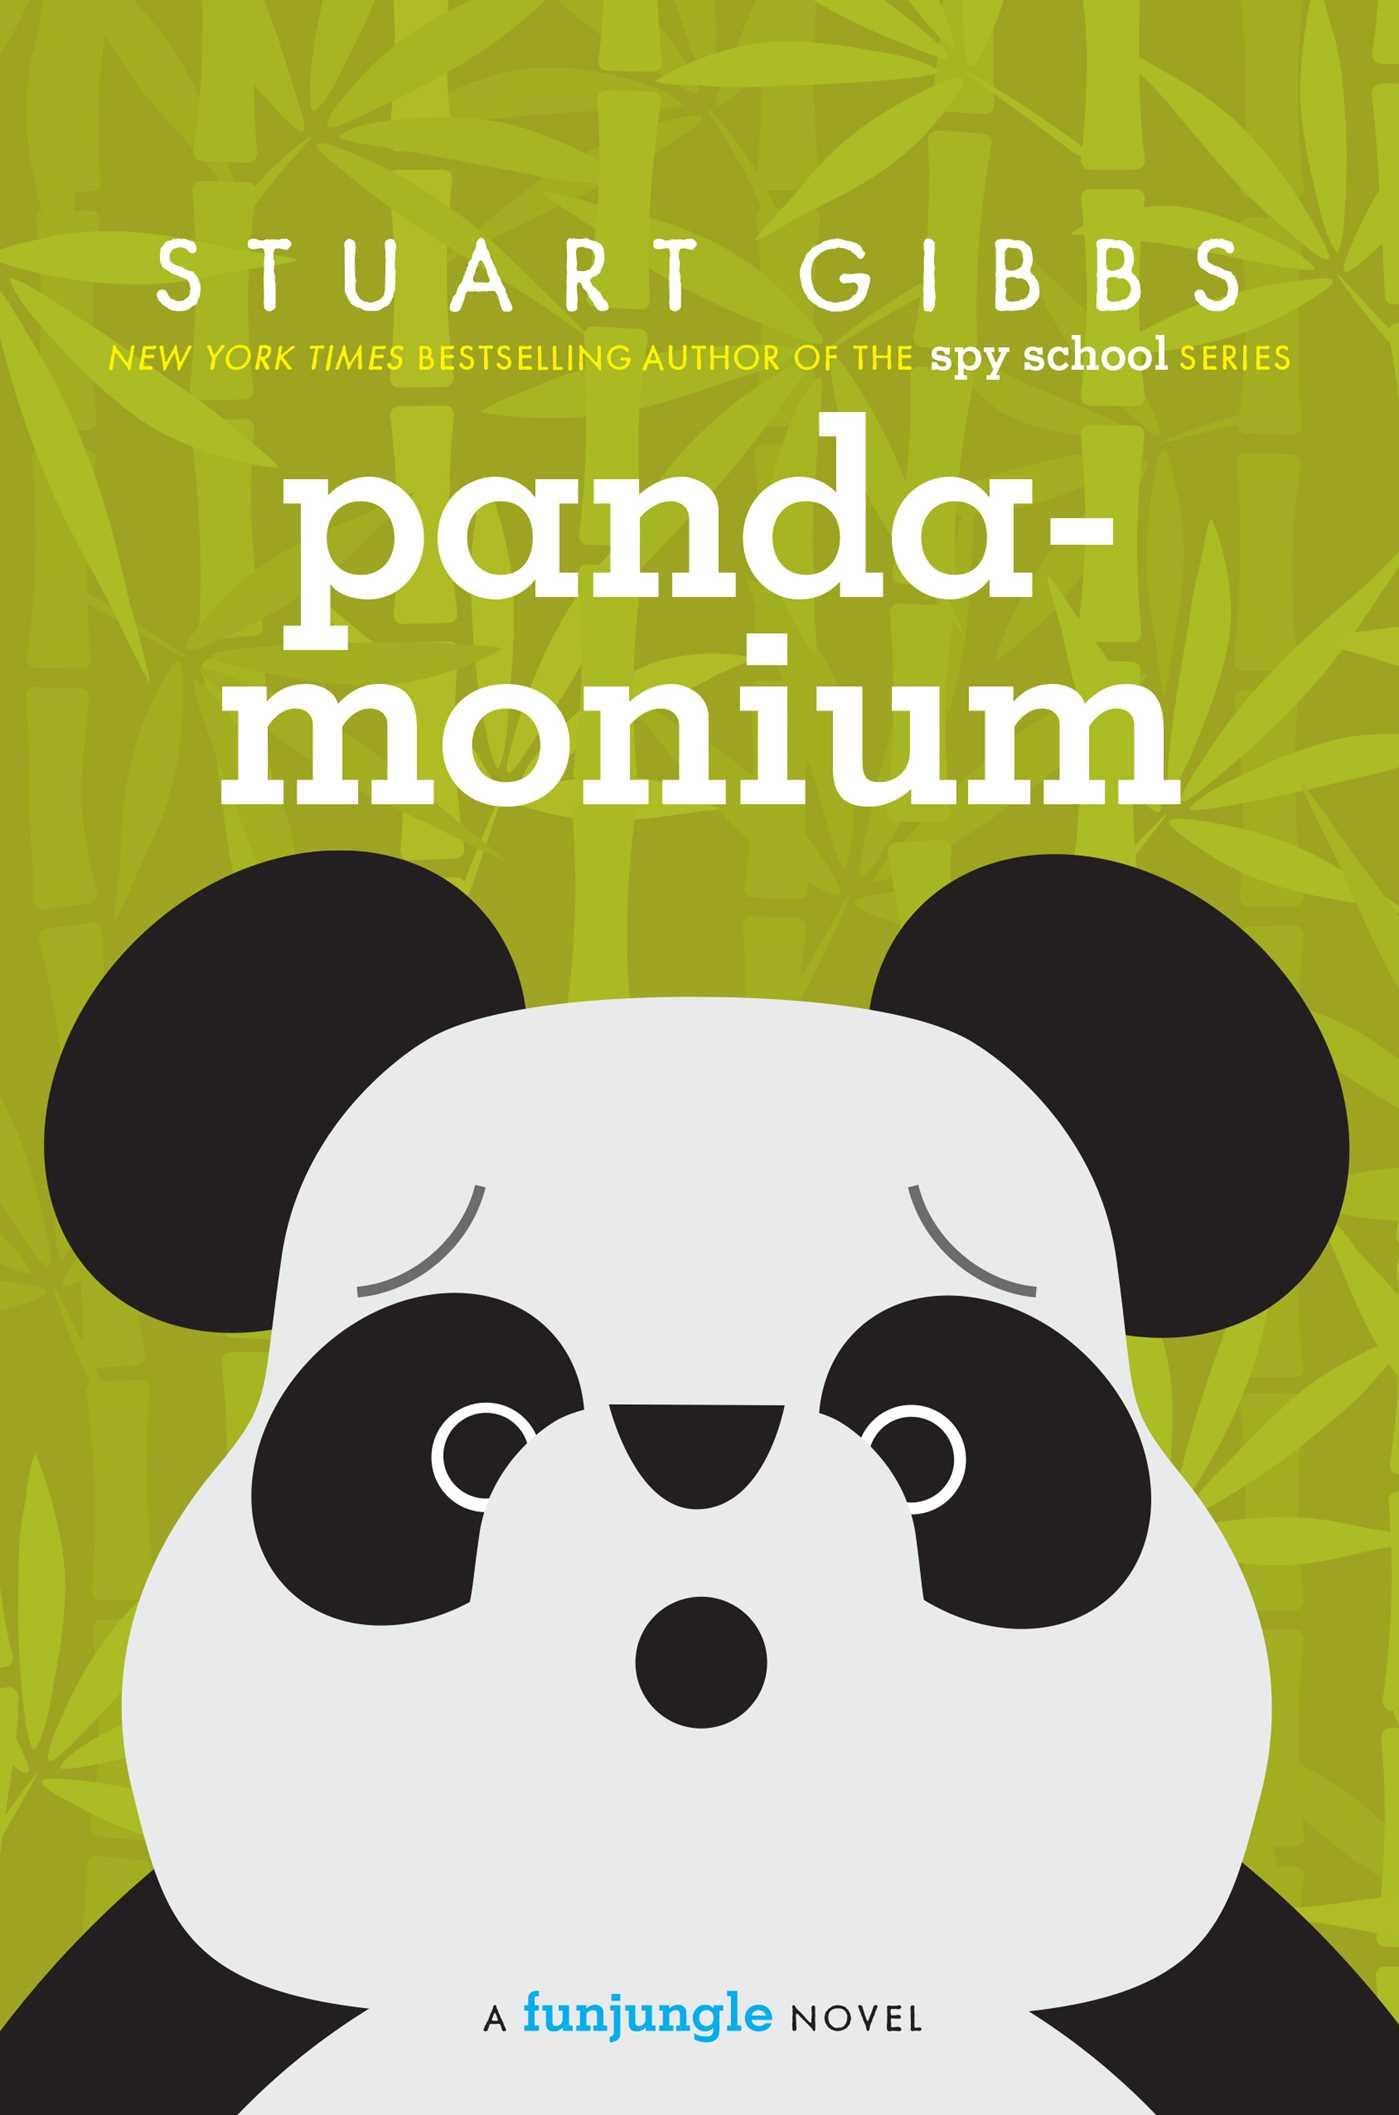 Panda monium 9781481445672 hr